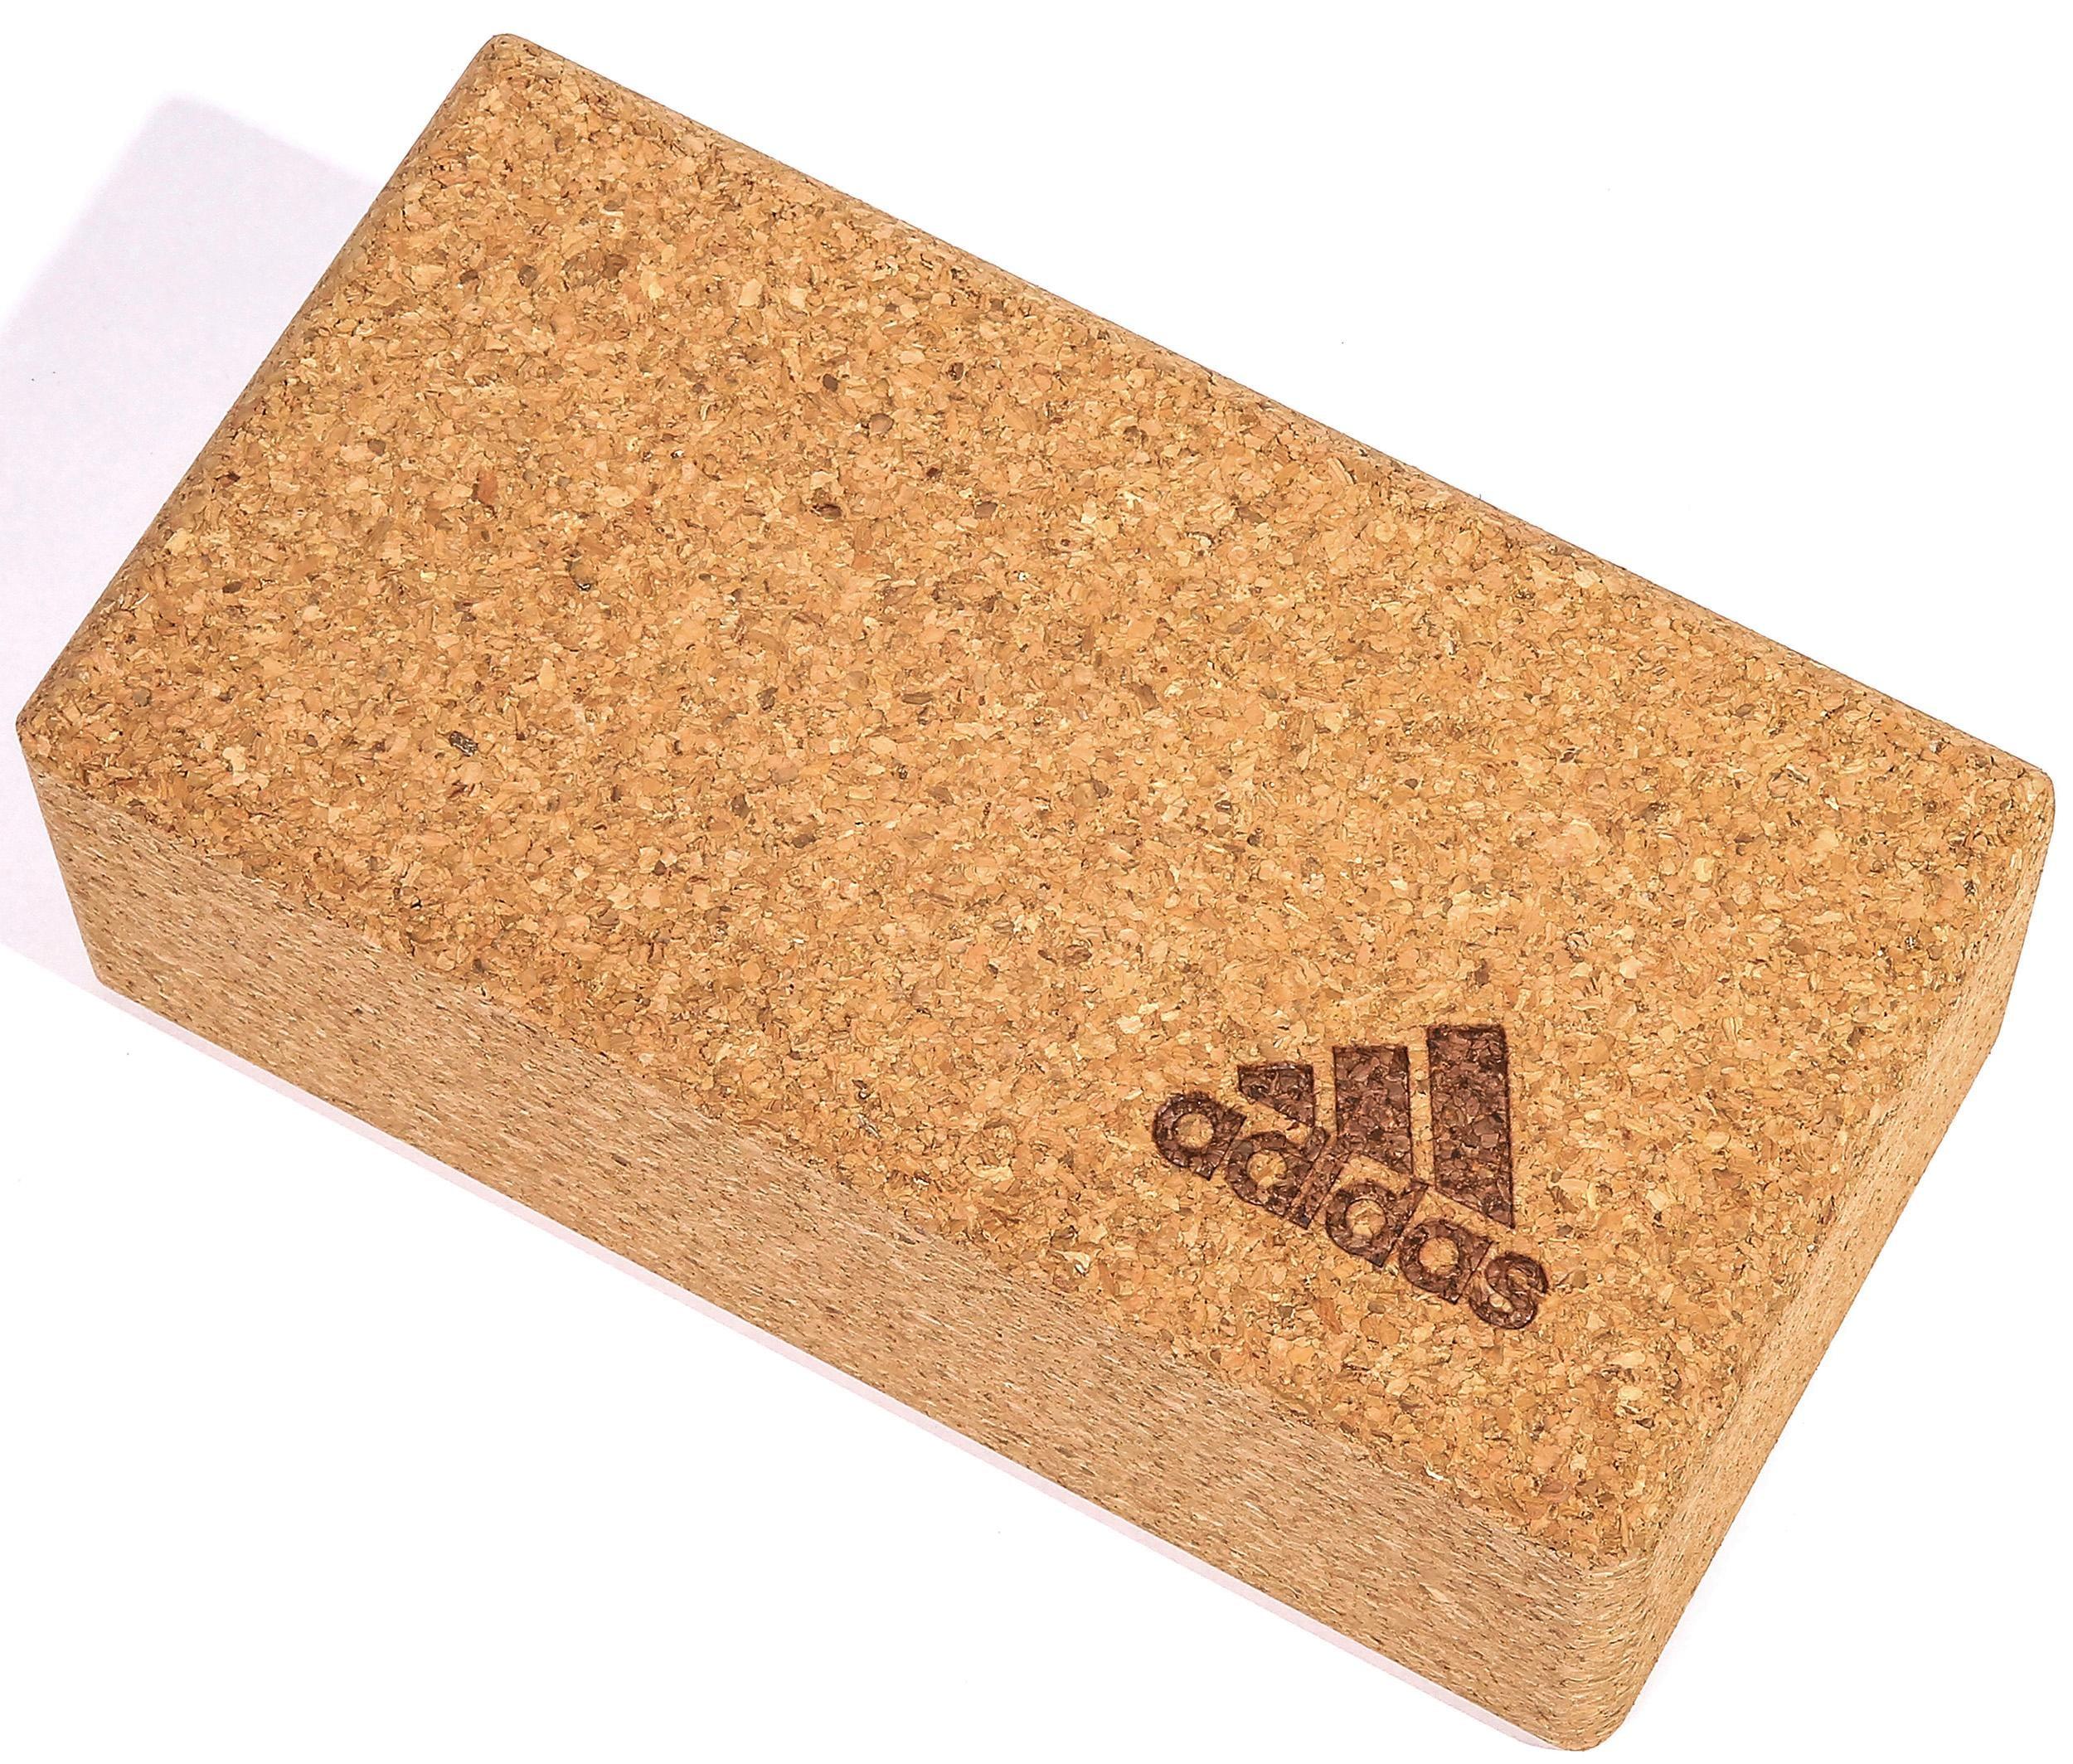 adidas Performance Yogablock Cork Yoga Block Technik & Freizeit/Sport & Freizeit/Fitnessgeräte/Fitness-Kleingeräte/Yogablöcke